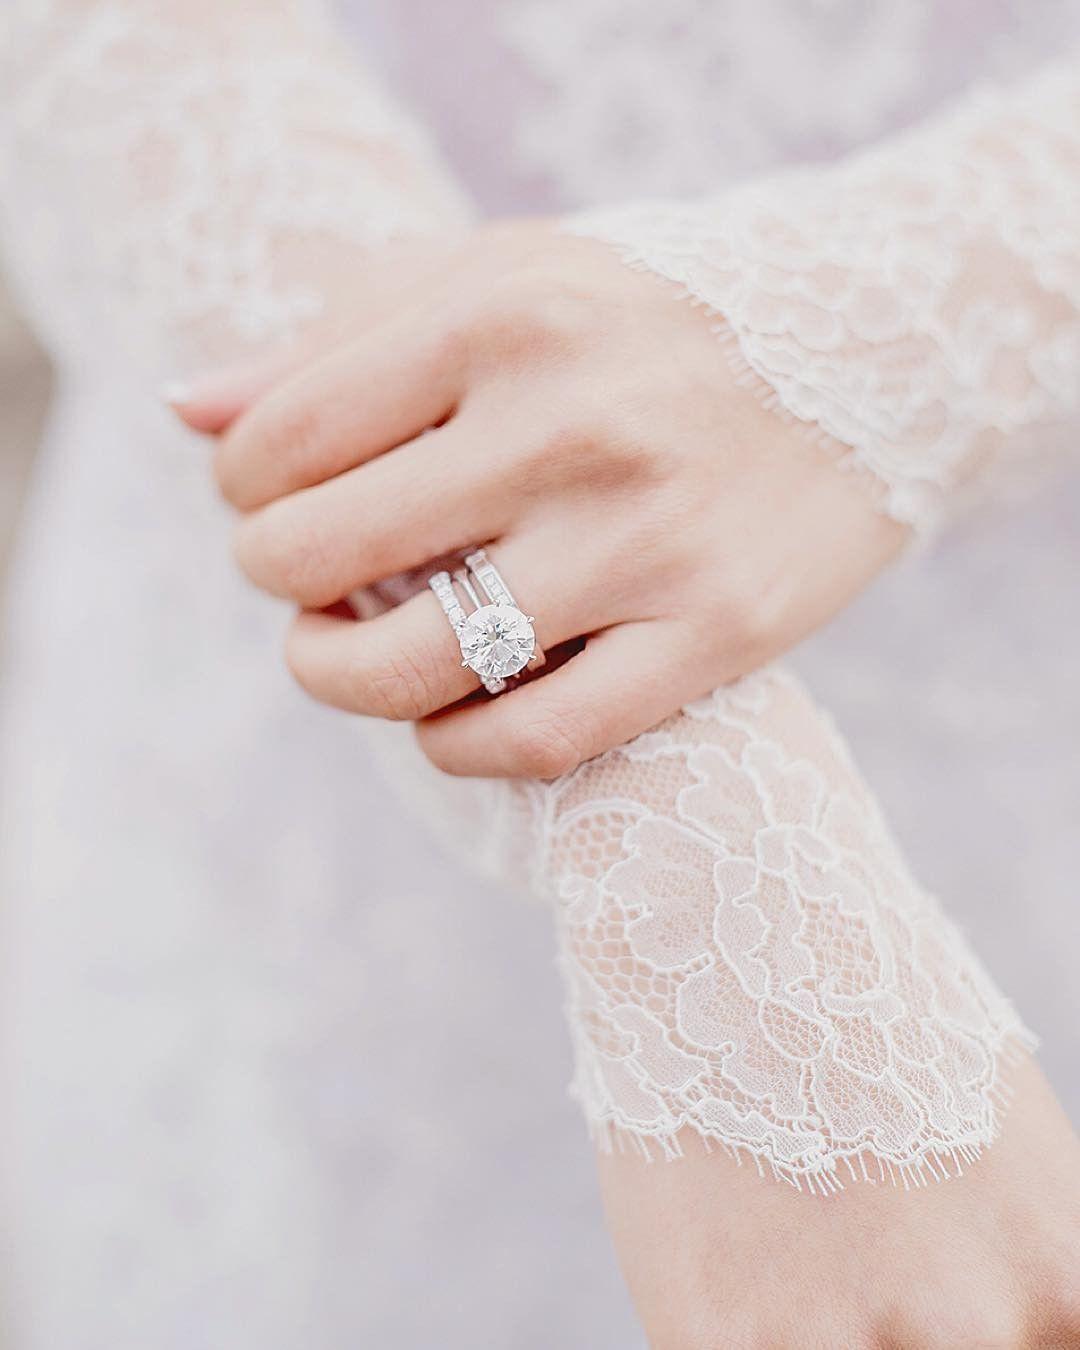 Beautiful #bling captured by @clairemorrisphotography Details  Pre-Wedding Paris  @jezylin . . . . . #parisphotographer #bridal #engagementring #aneldenoivado #diamonds #destinationwedding #weddingphotographerparis #parisjetaime #frenchwedding #weddingplannerparis #engagement #theweddingscoop #weddingdress #bridestyle #bride #noiva #casamento #casamentoemparia #preweddingphotography #paris #weddingdestination #weddinginspo